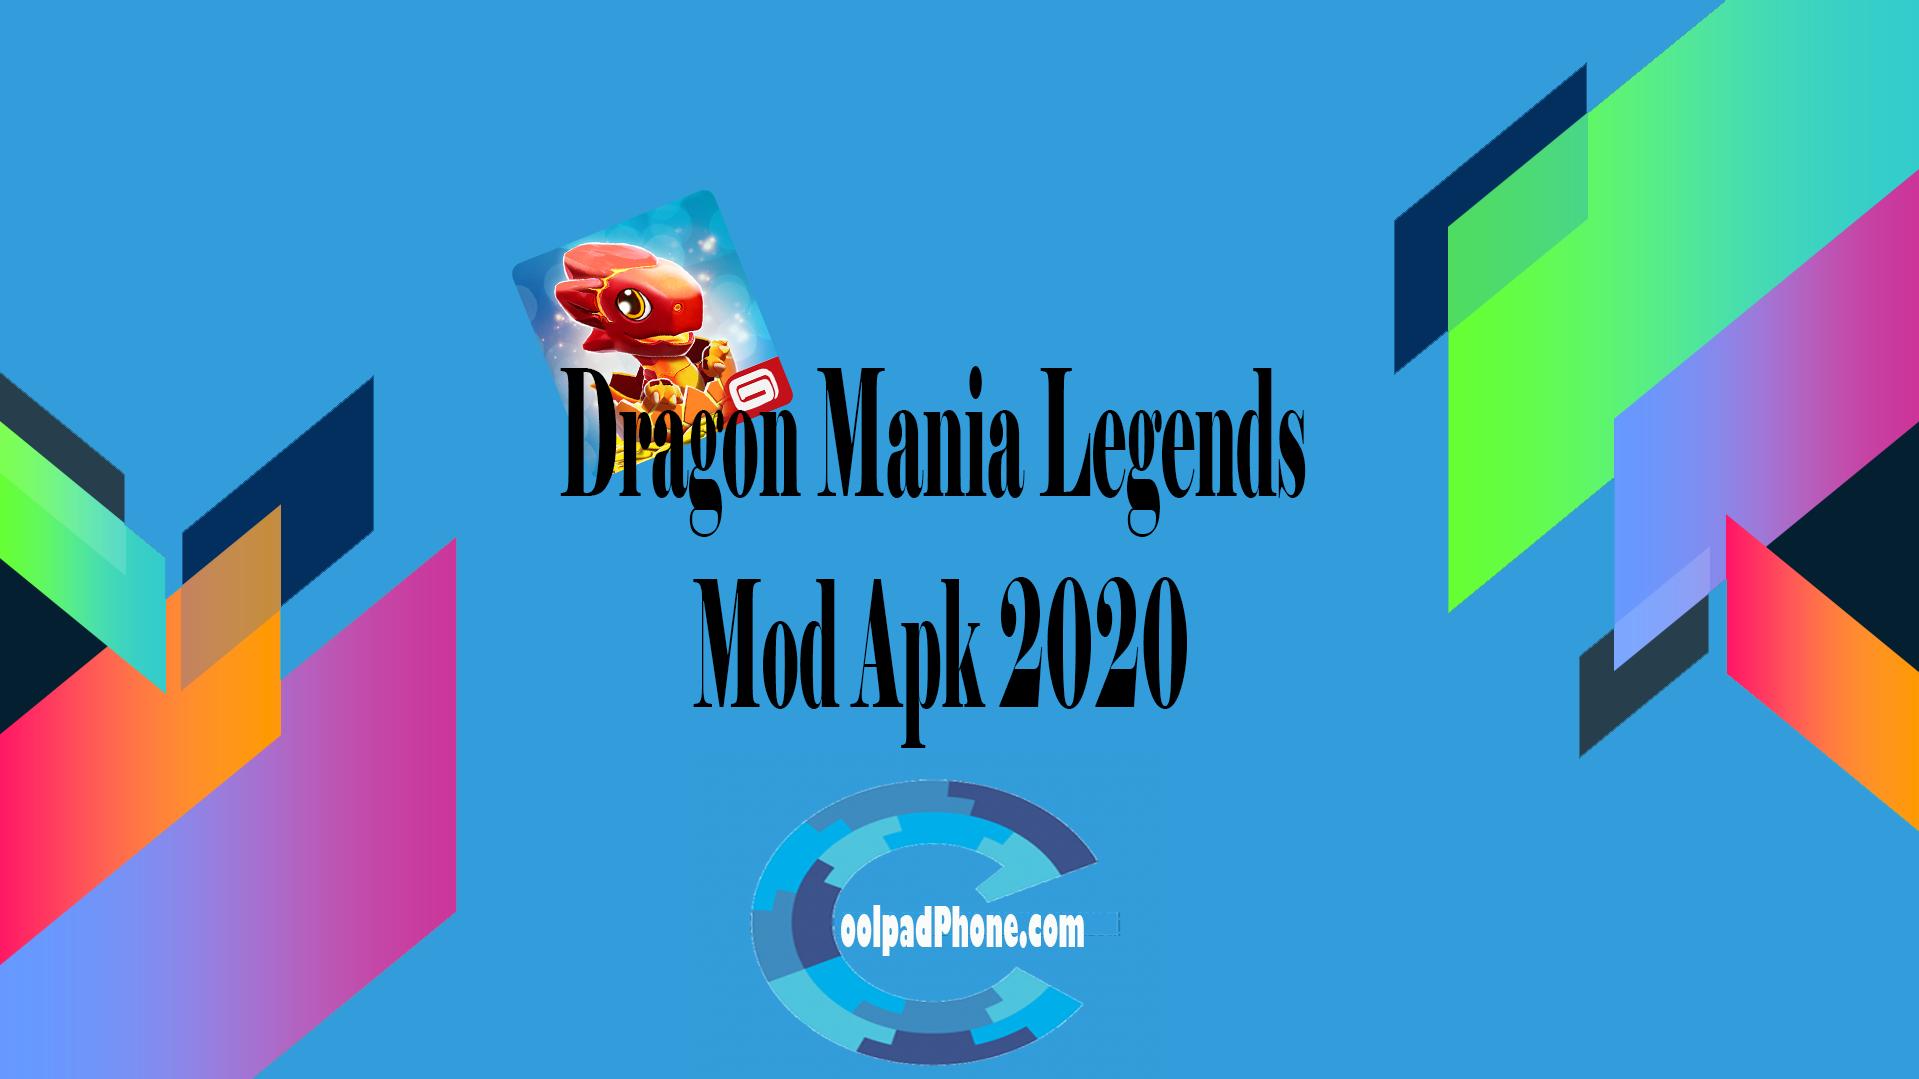 Dragon Mania Legends Mod Apk 2020